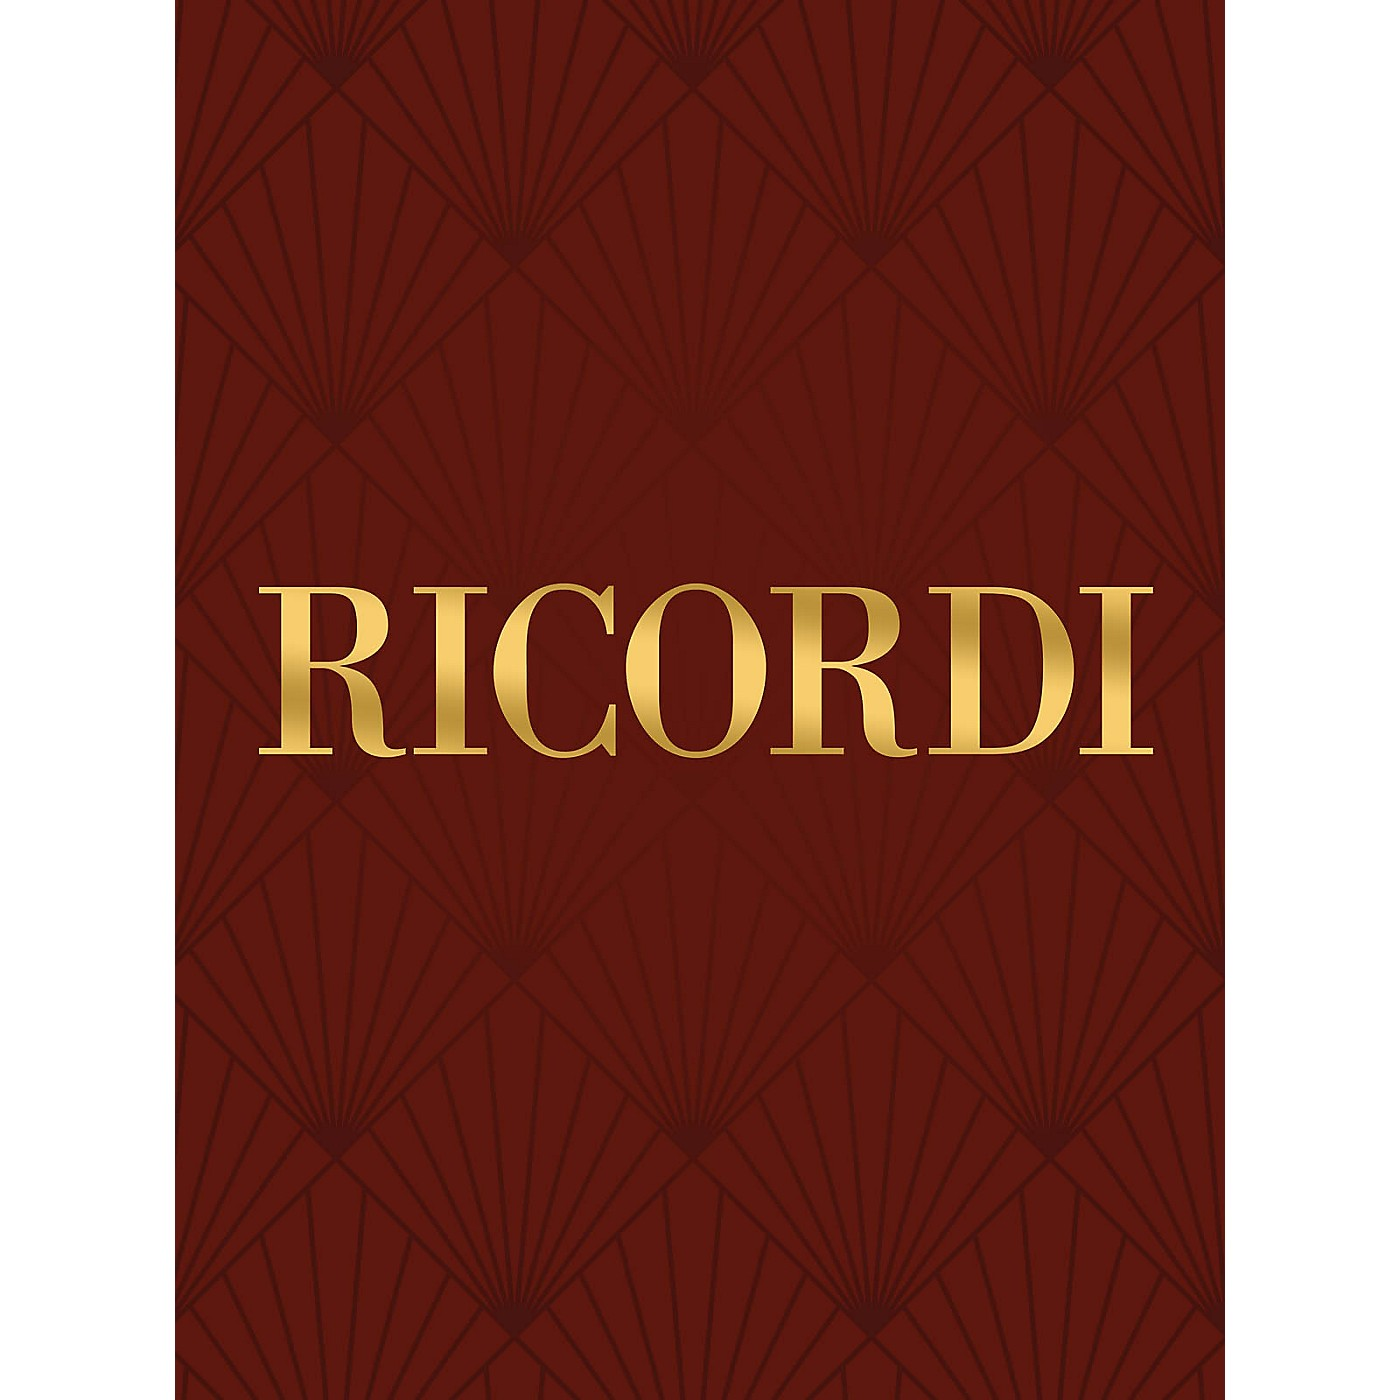 Ricordi Toccata and Fugue in D Minor (Dorian) Piano Solo Composed by Johann Sebastian Bach Edited by Carl Tausig thumbnail